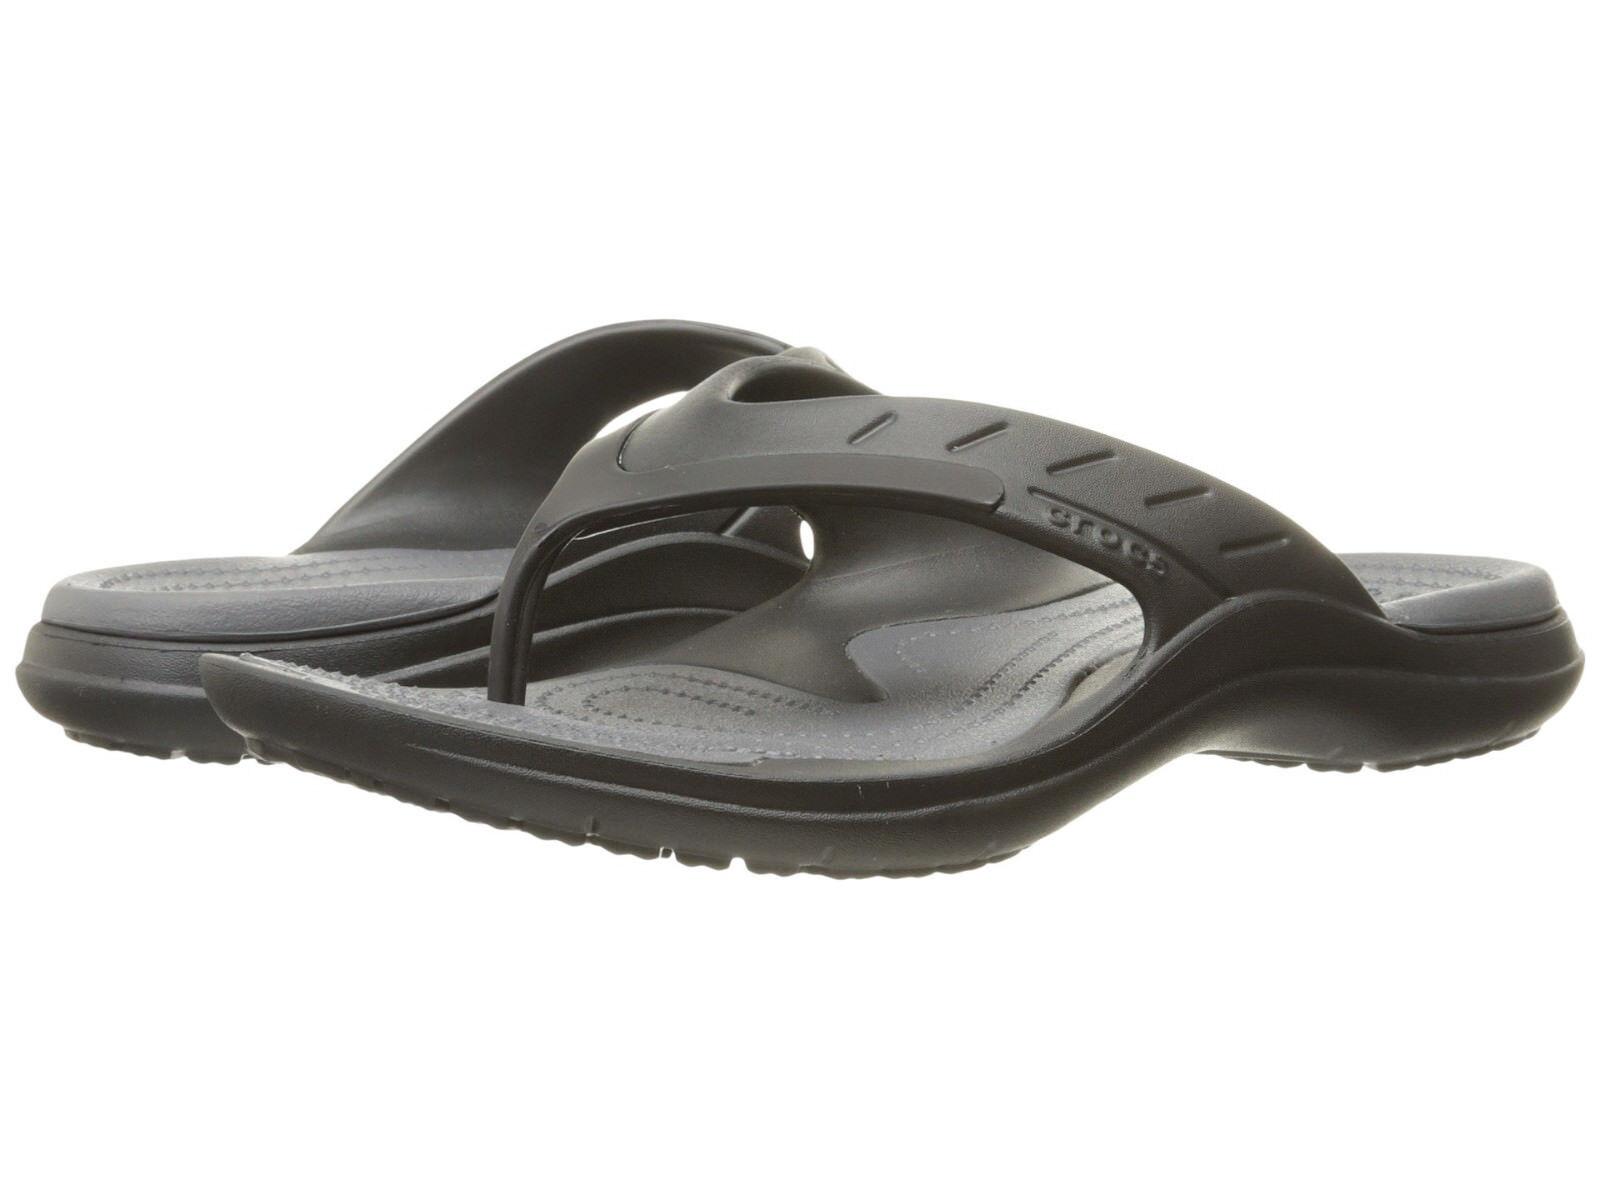 Men Crocs Modi Sport Flip Flop Sandal 202636-02S Black Graphit 100% Original New